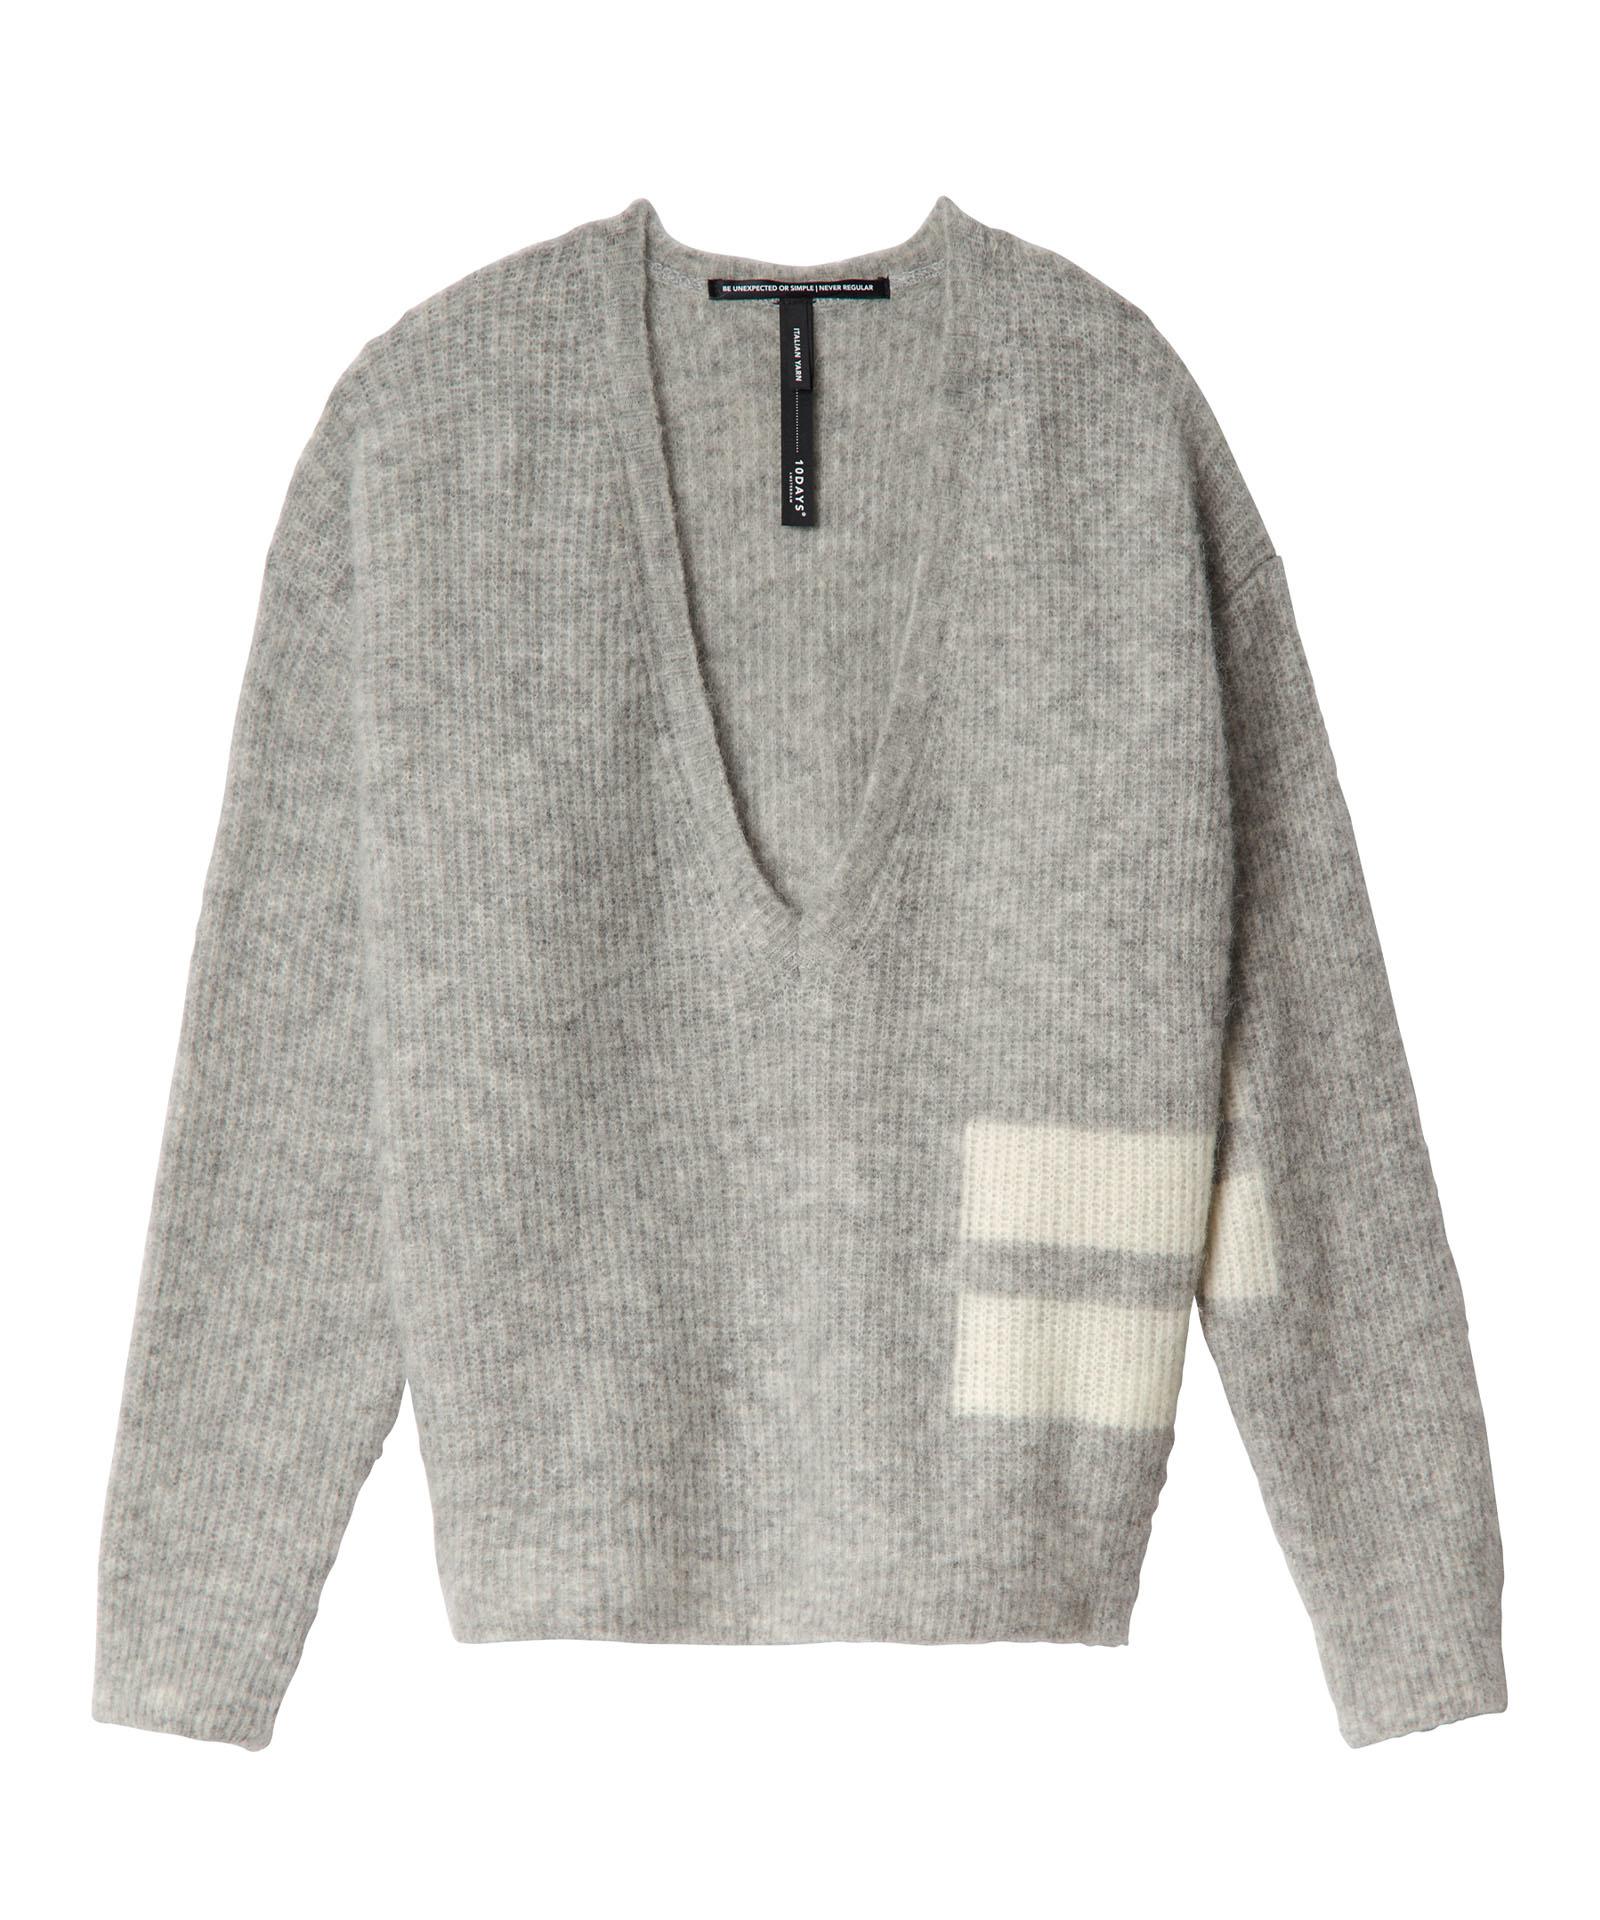 grey v-neck two-stripe knit